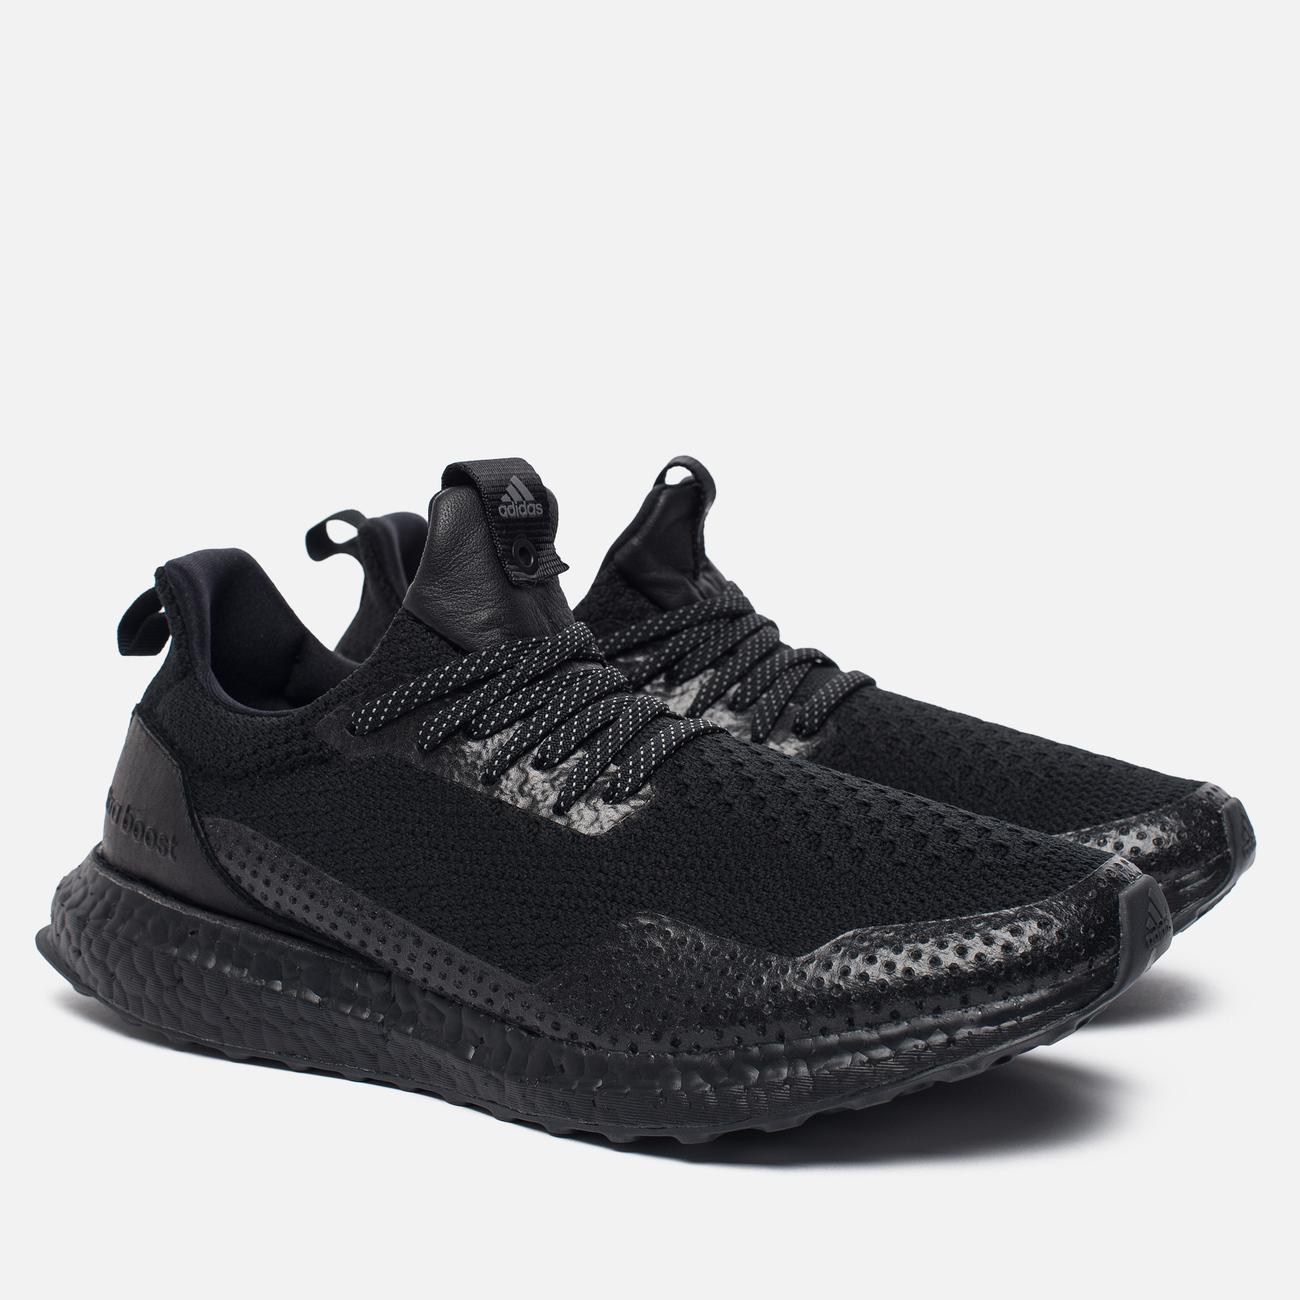 Мужские кроссовки adidas Consortium x Haven Ultra Boost Primeknit Black